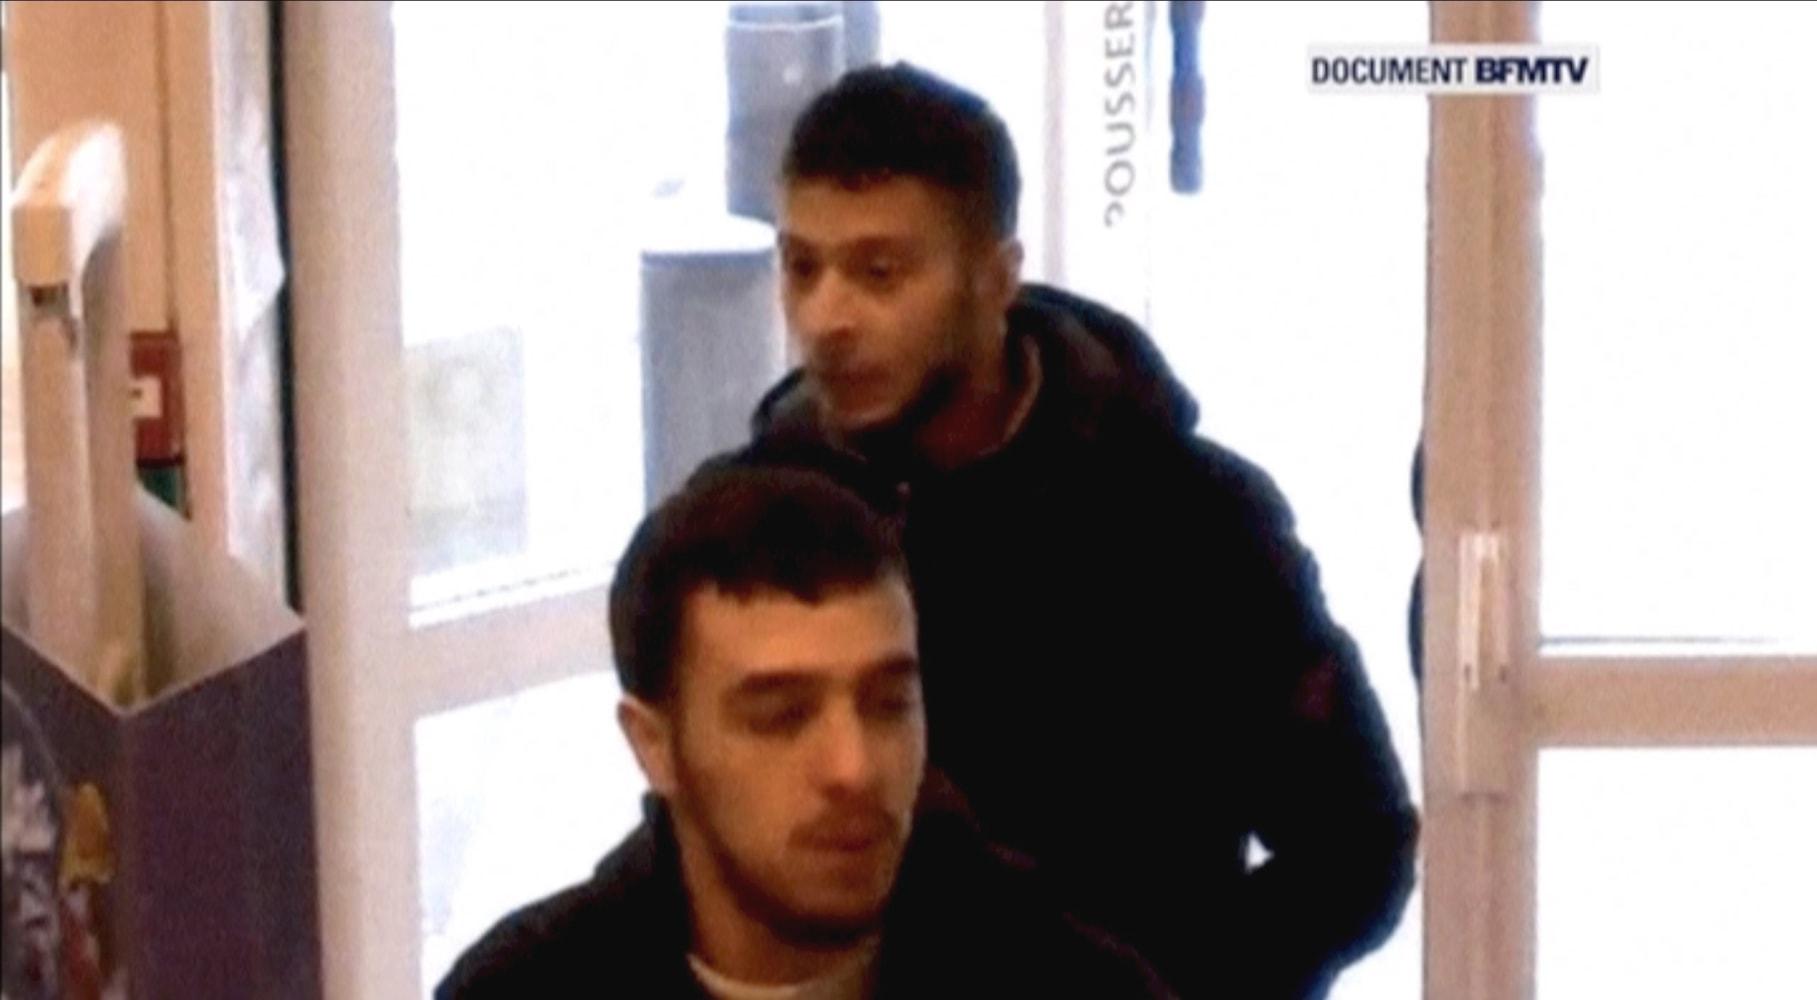 CCTV of 'Europe's most wanted' Salah Abdeslam following Paris attacks